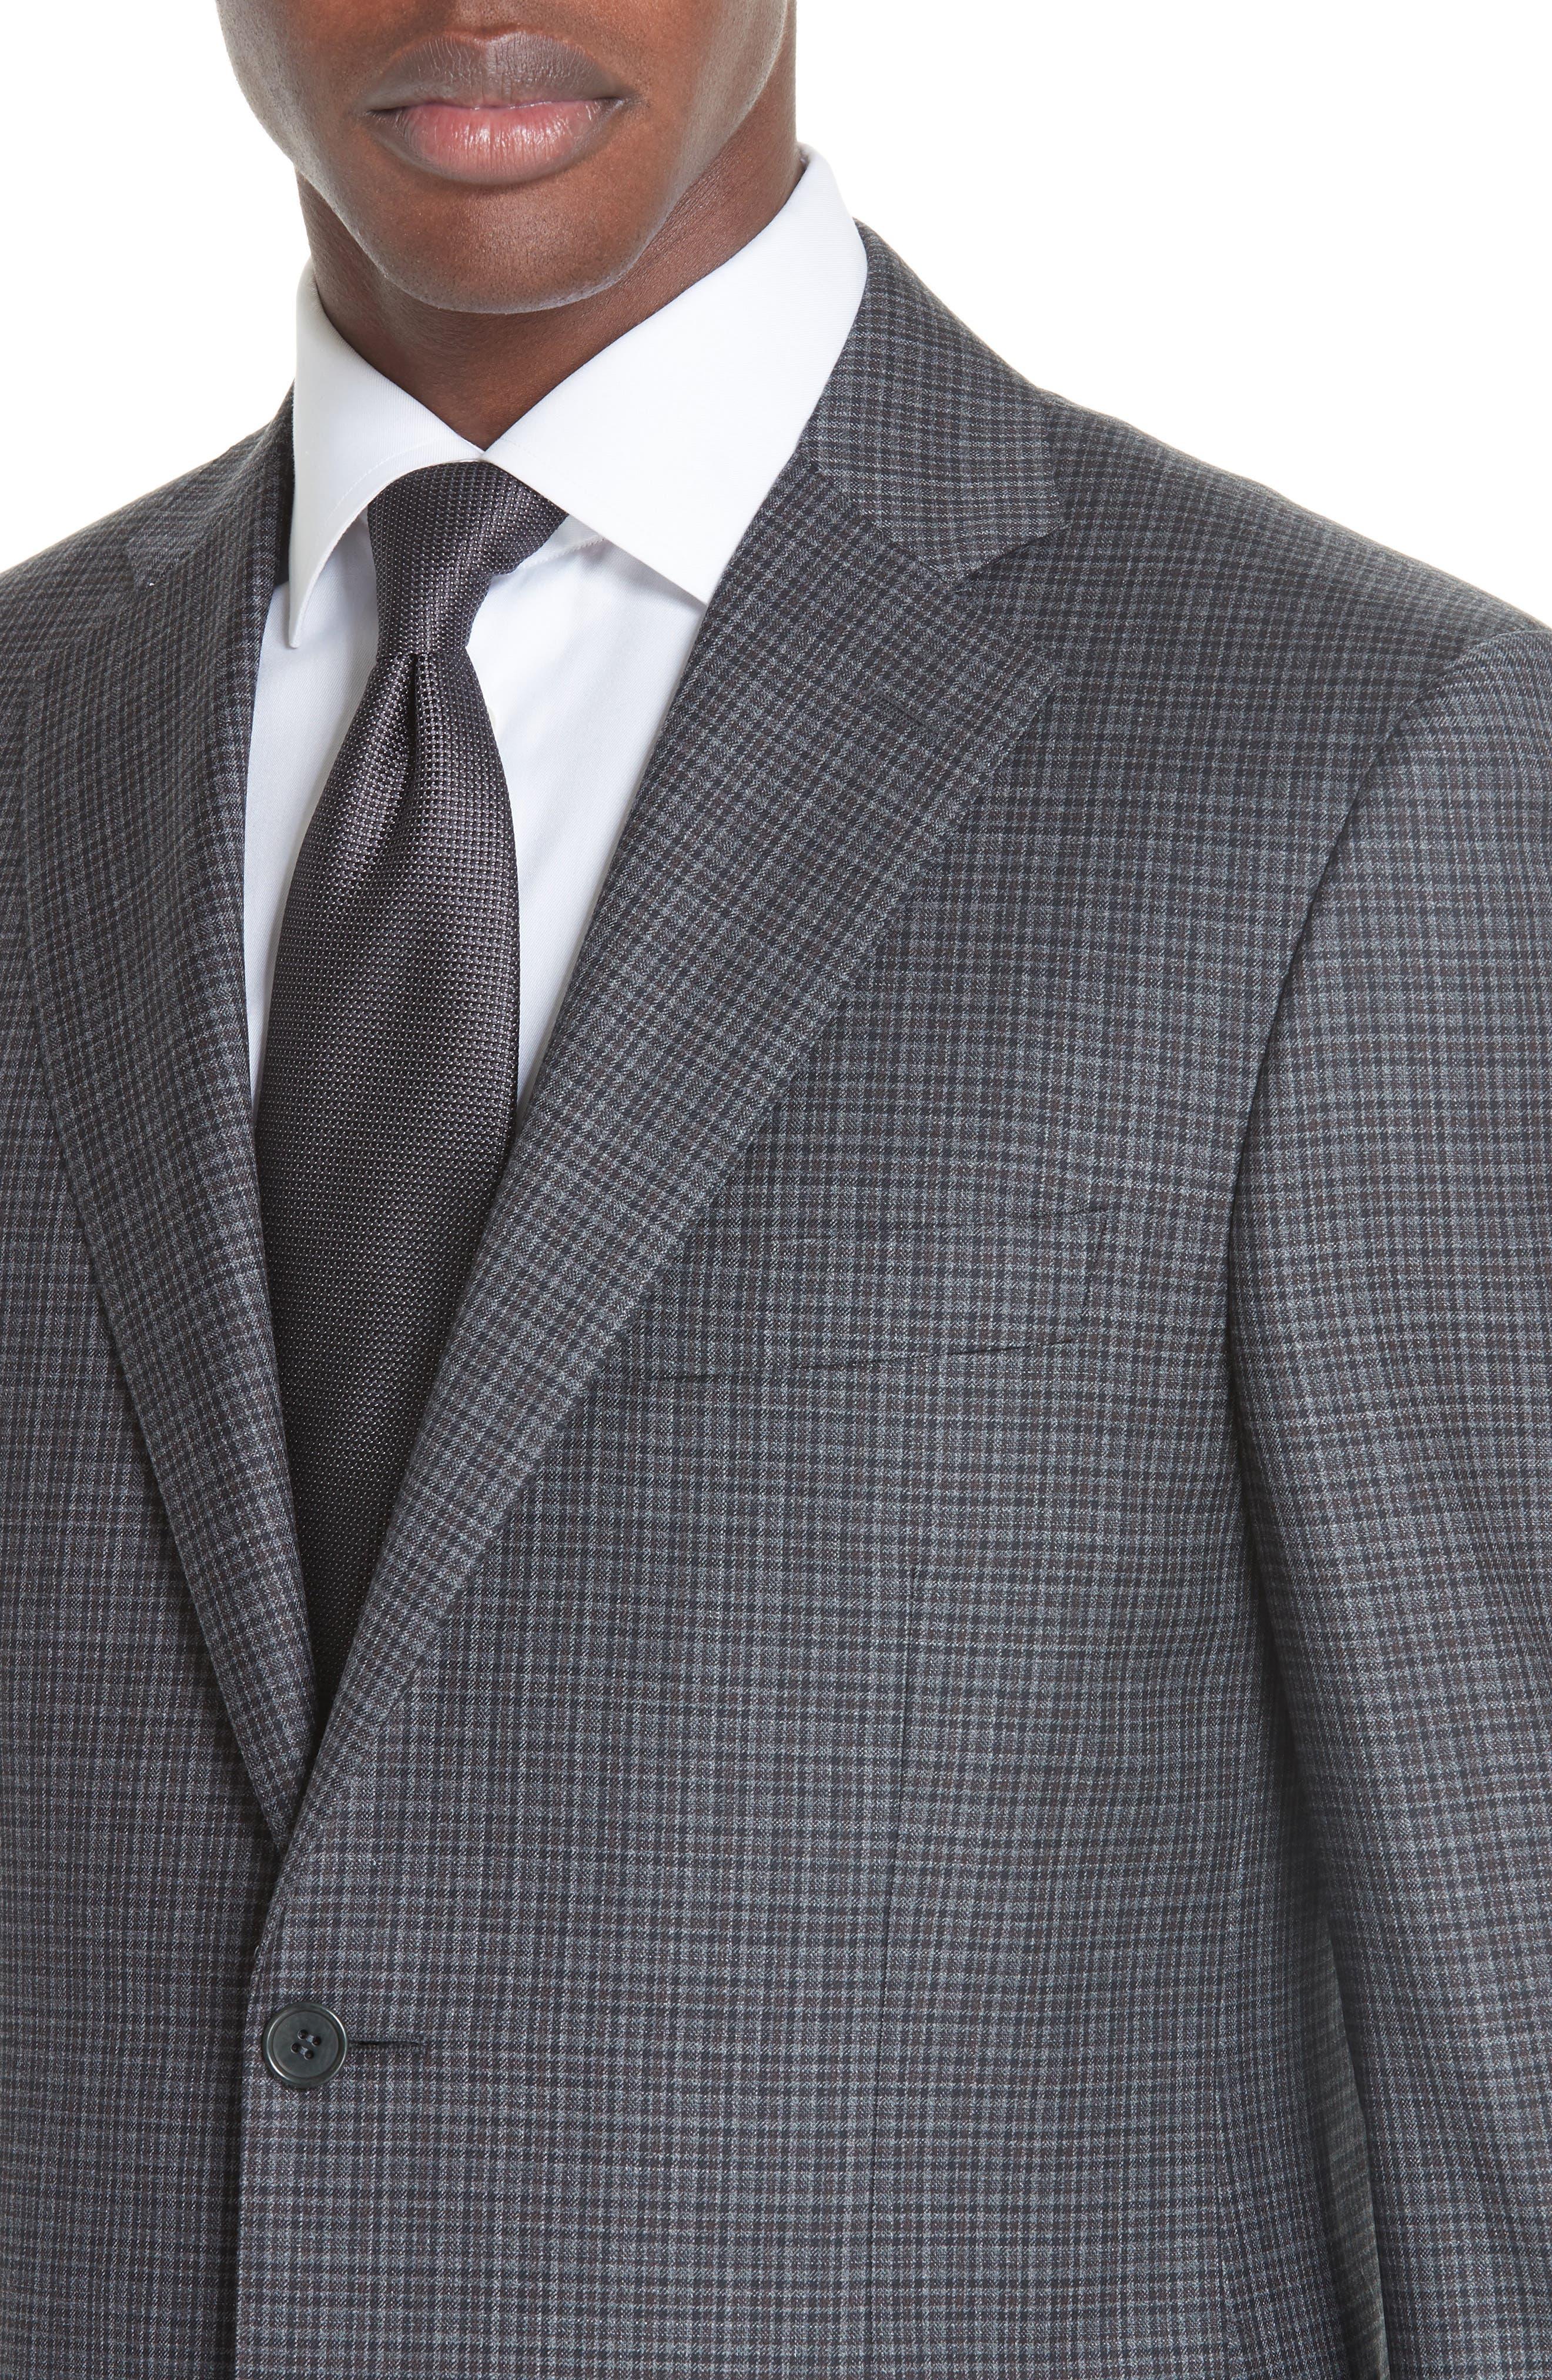 Classic Fit Check Wool Sport Coat,                             Alternate thumbnail 4, color,                             DARK GREY